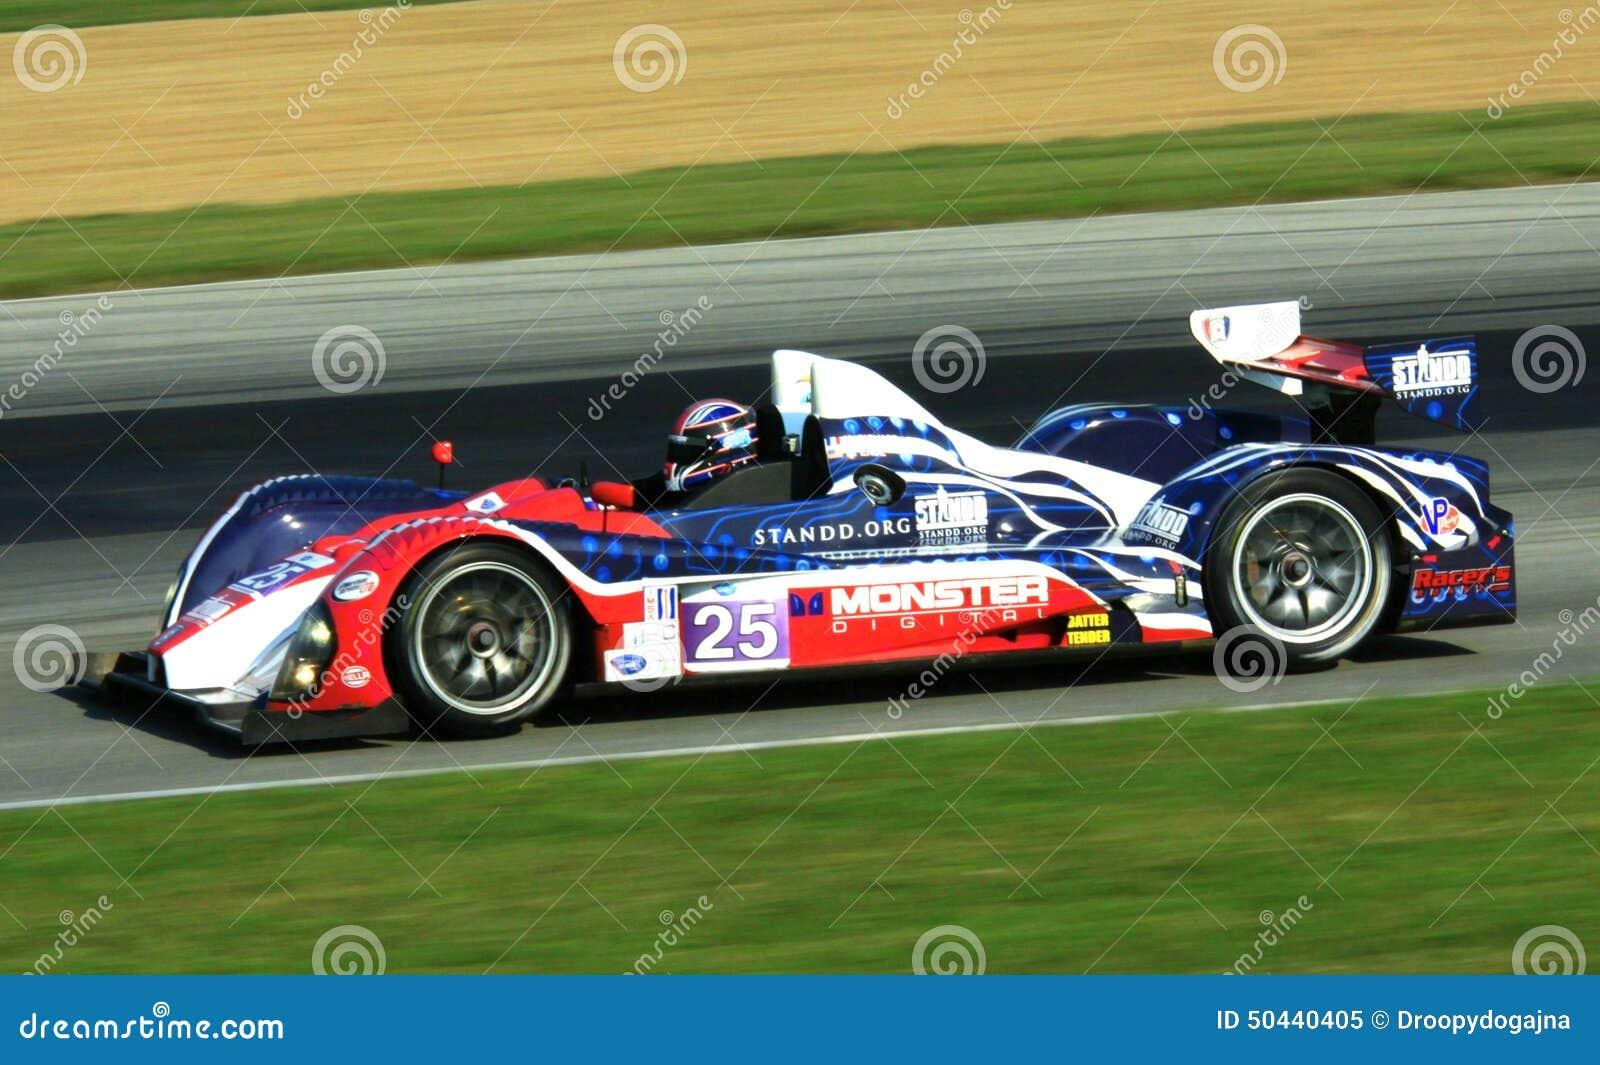 Le Mans Prototype Race Car Editorial Image Image Of Mans 50440405